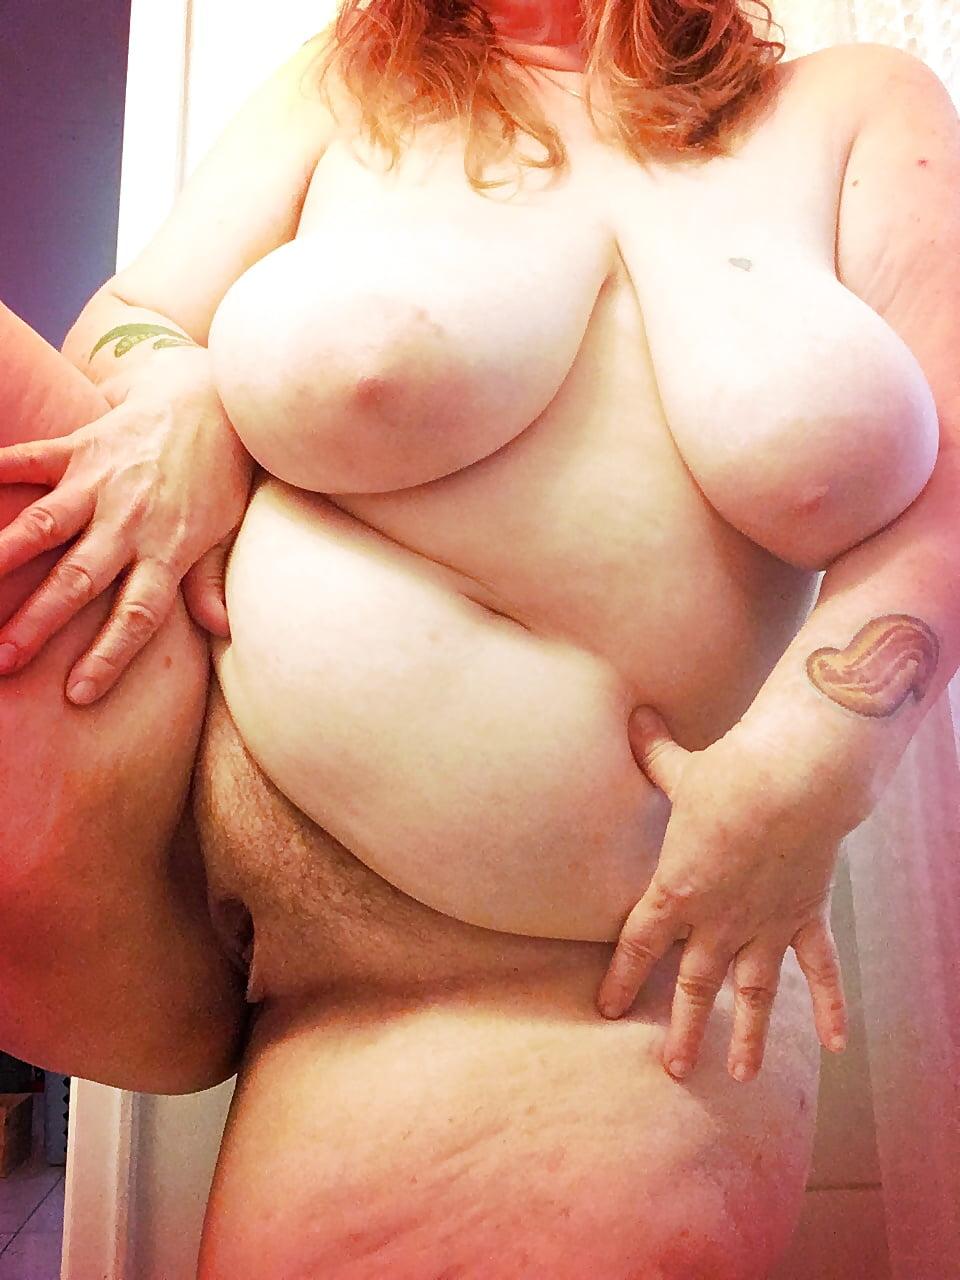 Punishment erotic spank pussy